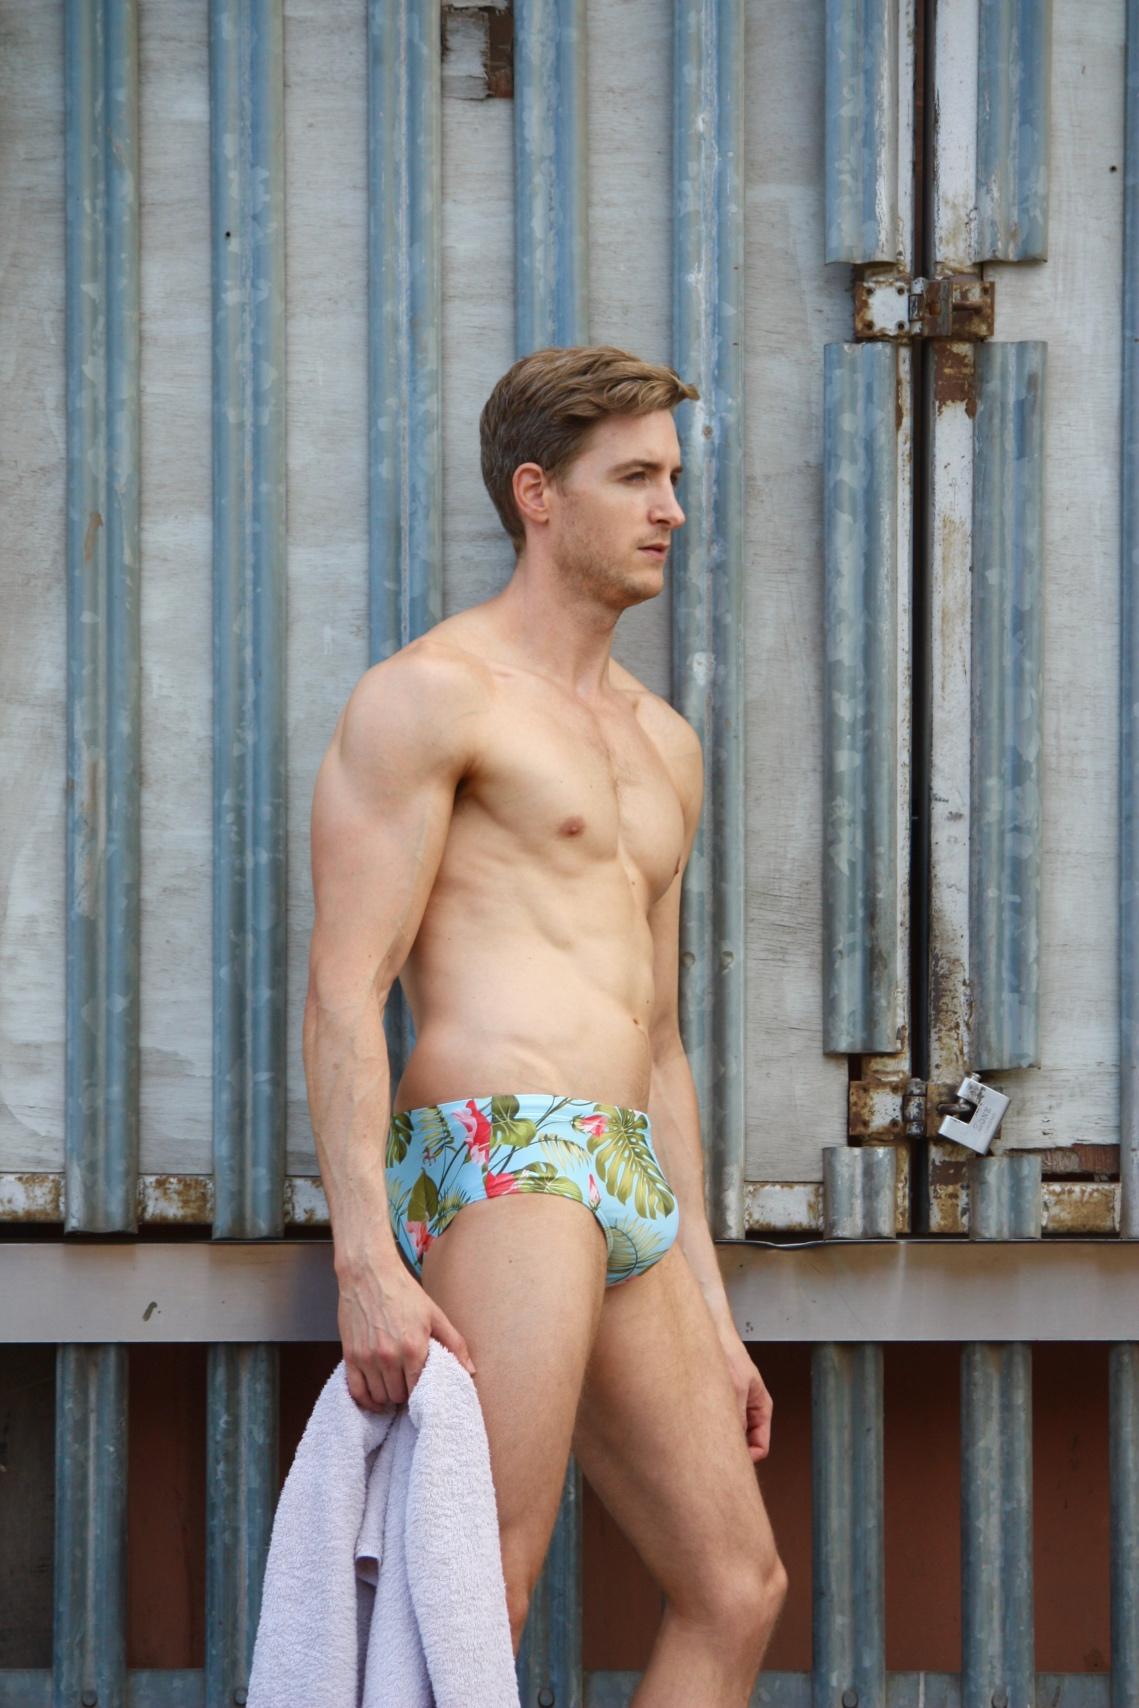 Paul Smollen shoot featuring Model Danny